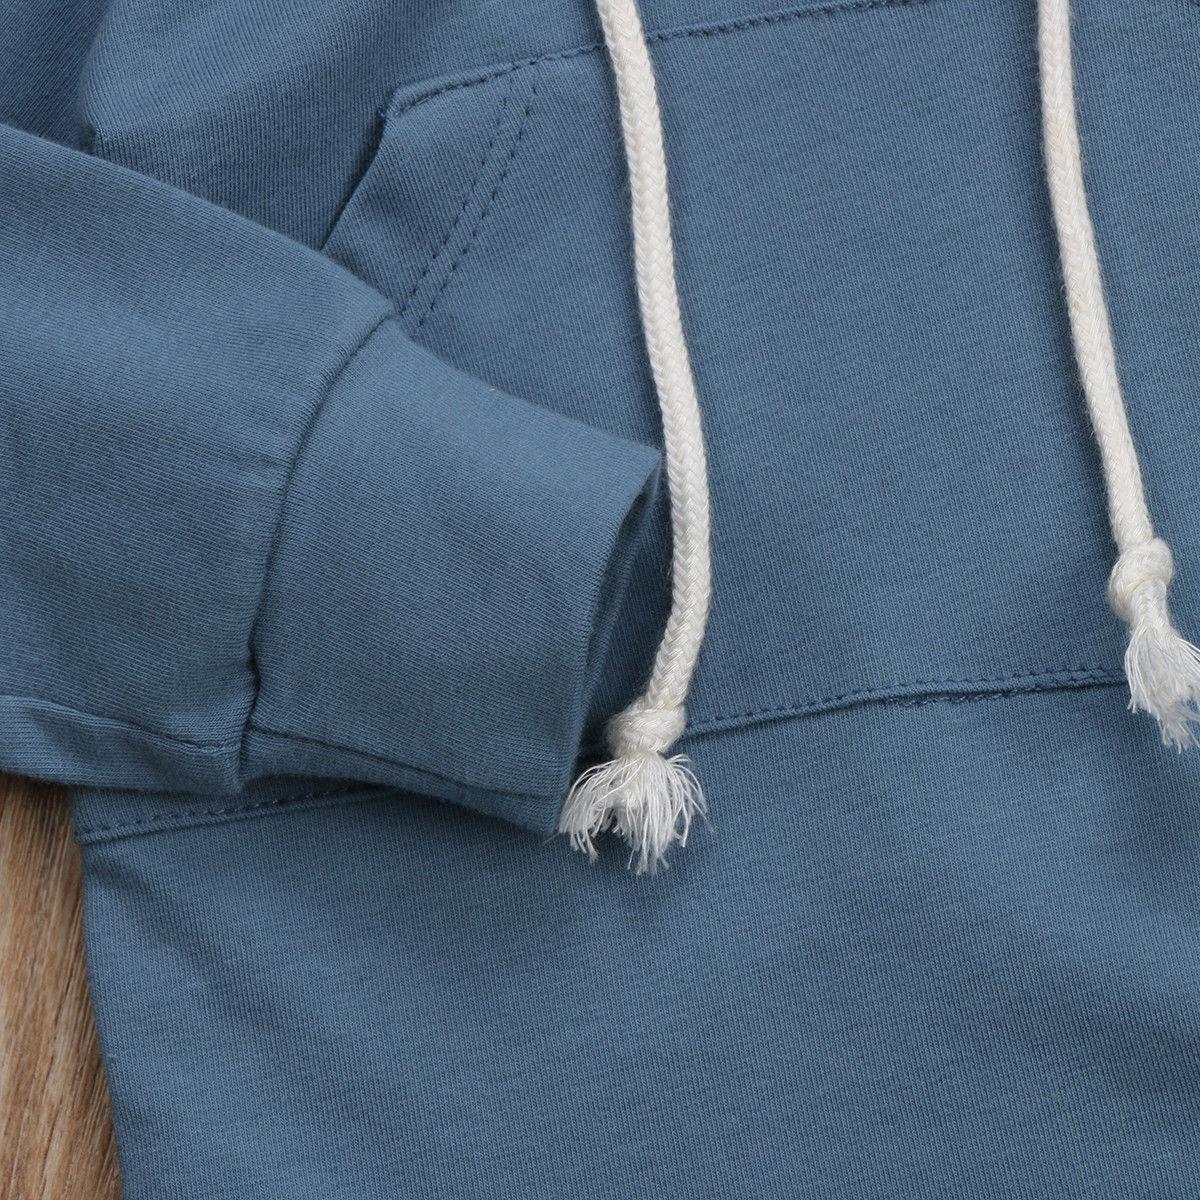 Baby Kleidung Herbst Baby Jungen Bruder Hoodie Sweatshirt Mit Kapuze Tops Strampler Overall Kleidung Familie Passenden Outfits